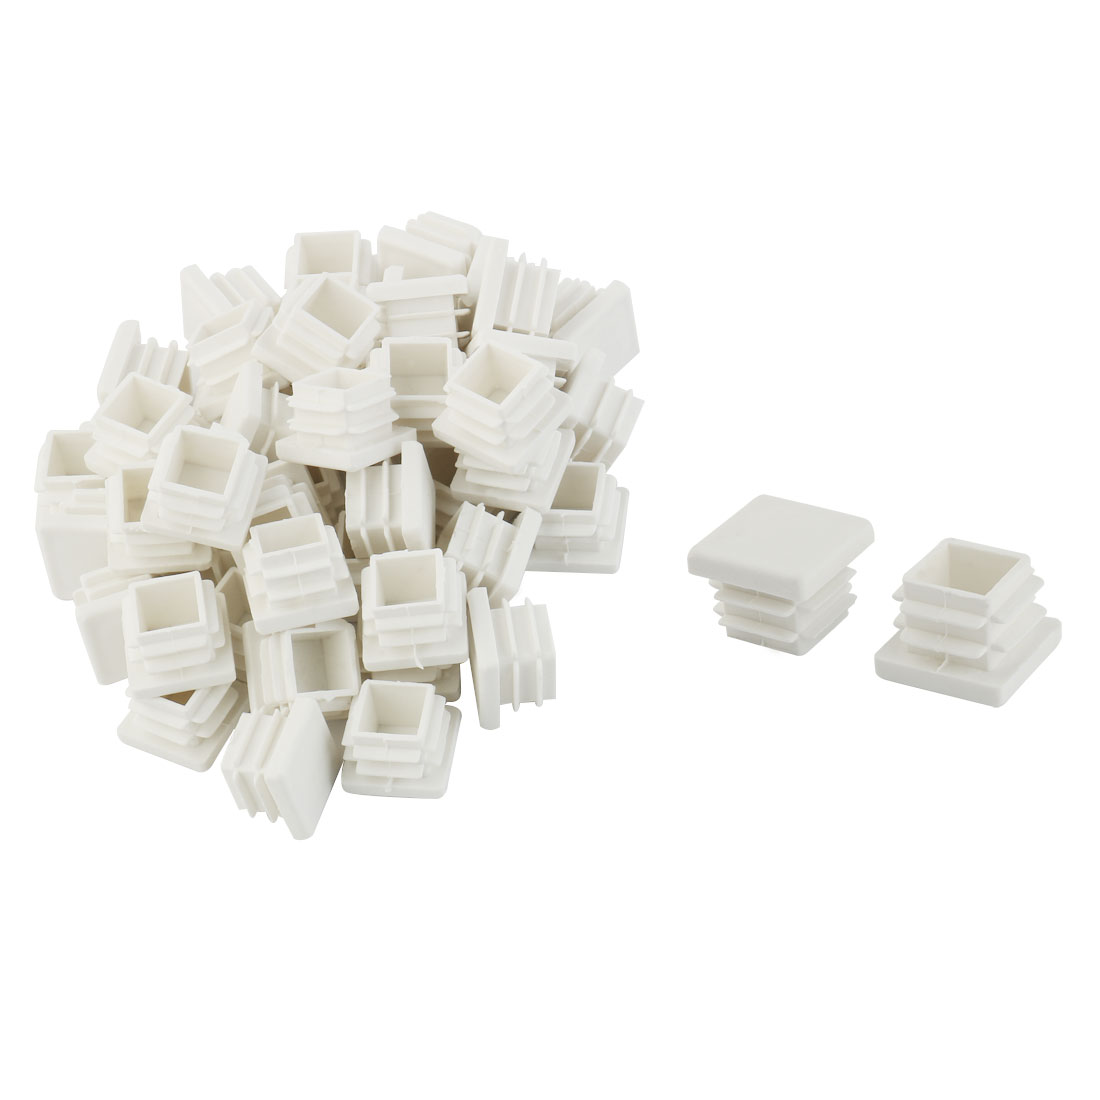 Plastic Square Tube Pipe Inserts End Blanking Caps White 19mmx19mm 50 Pcs